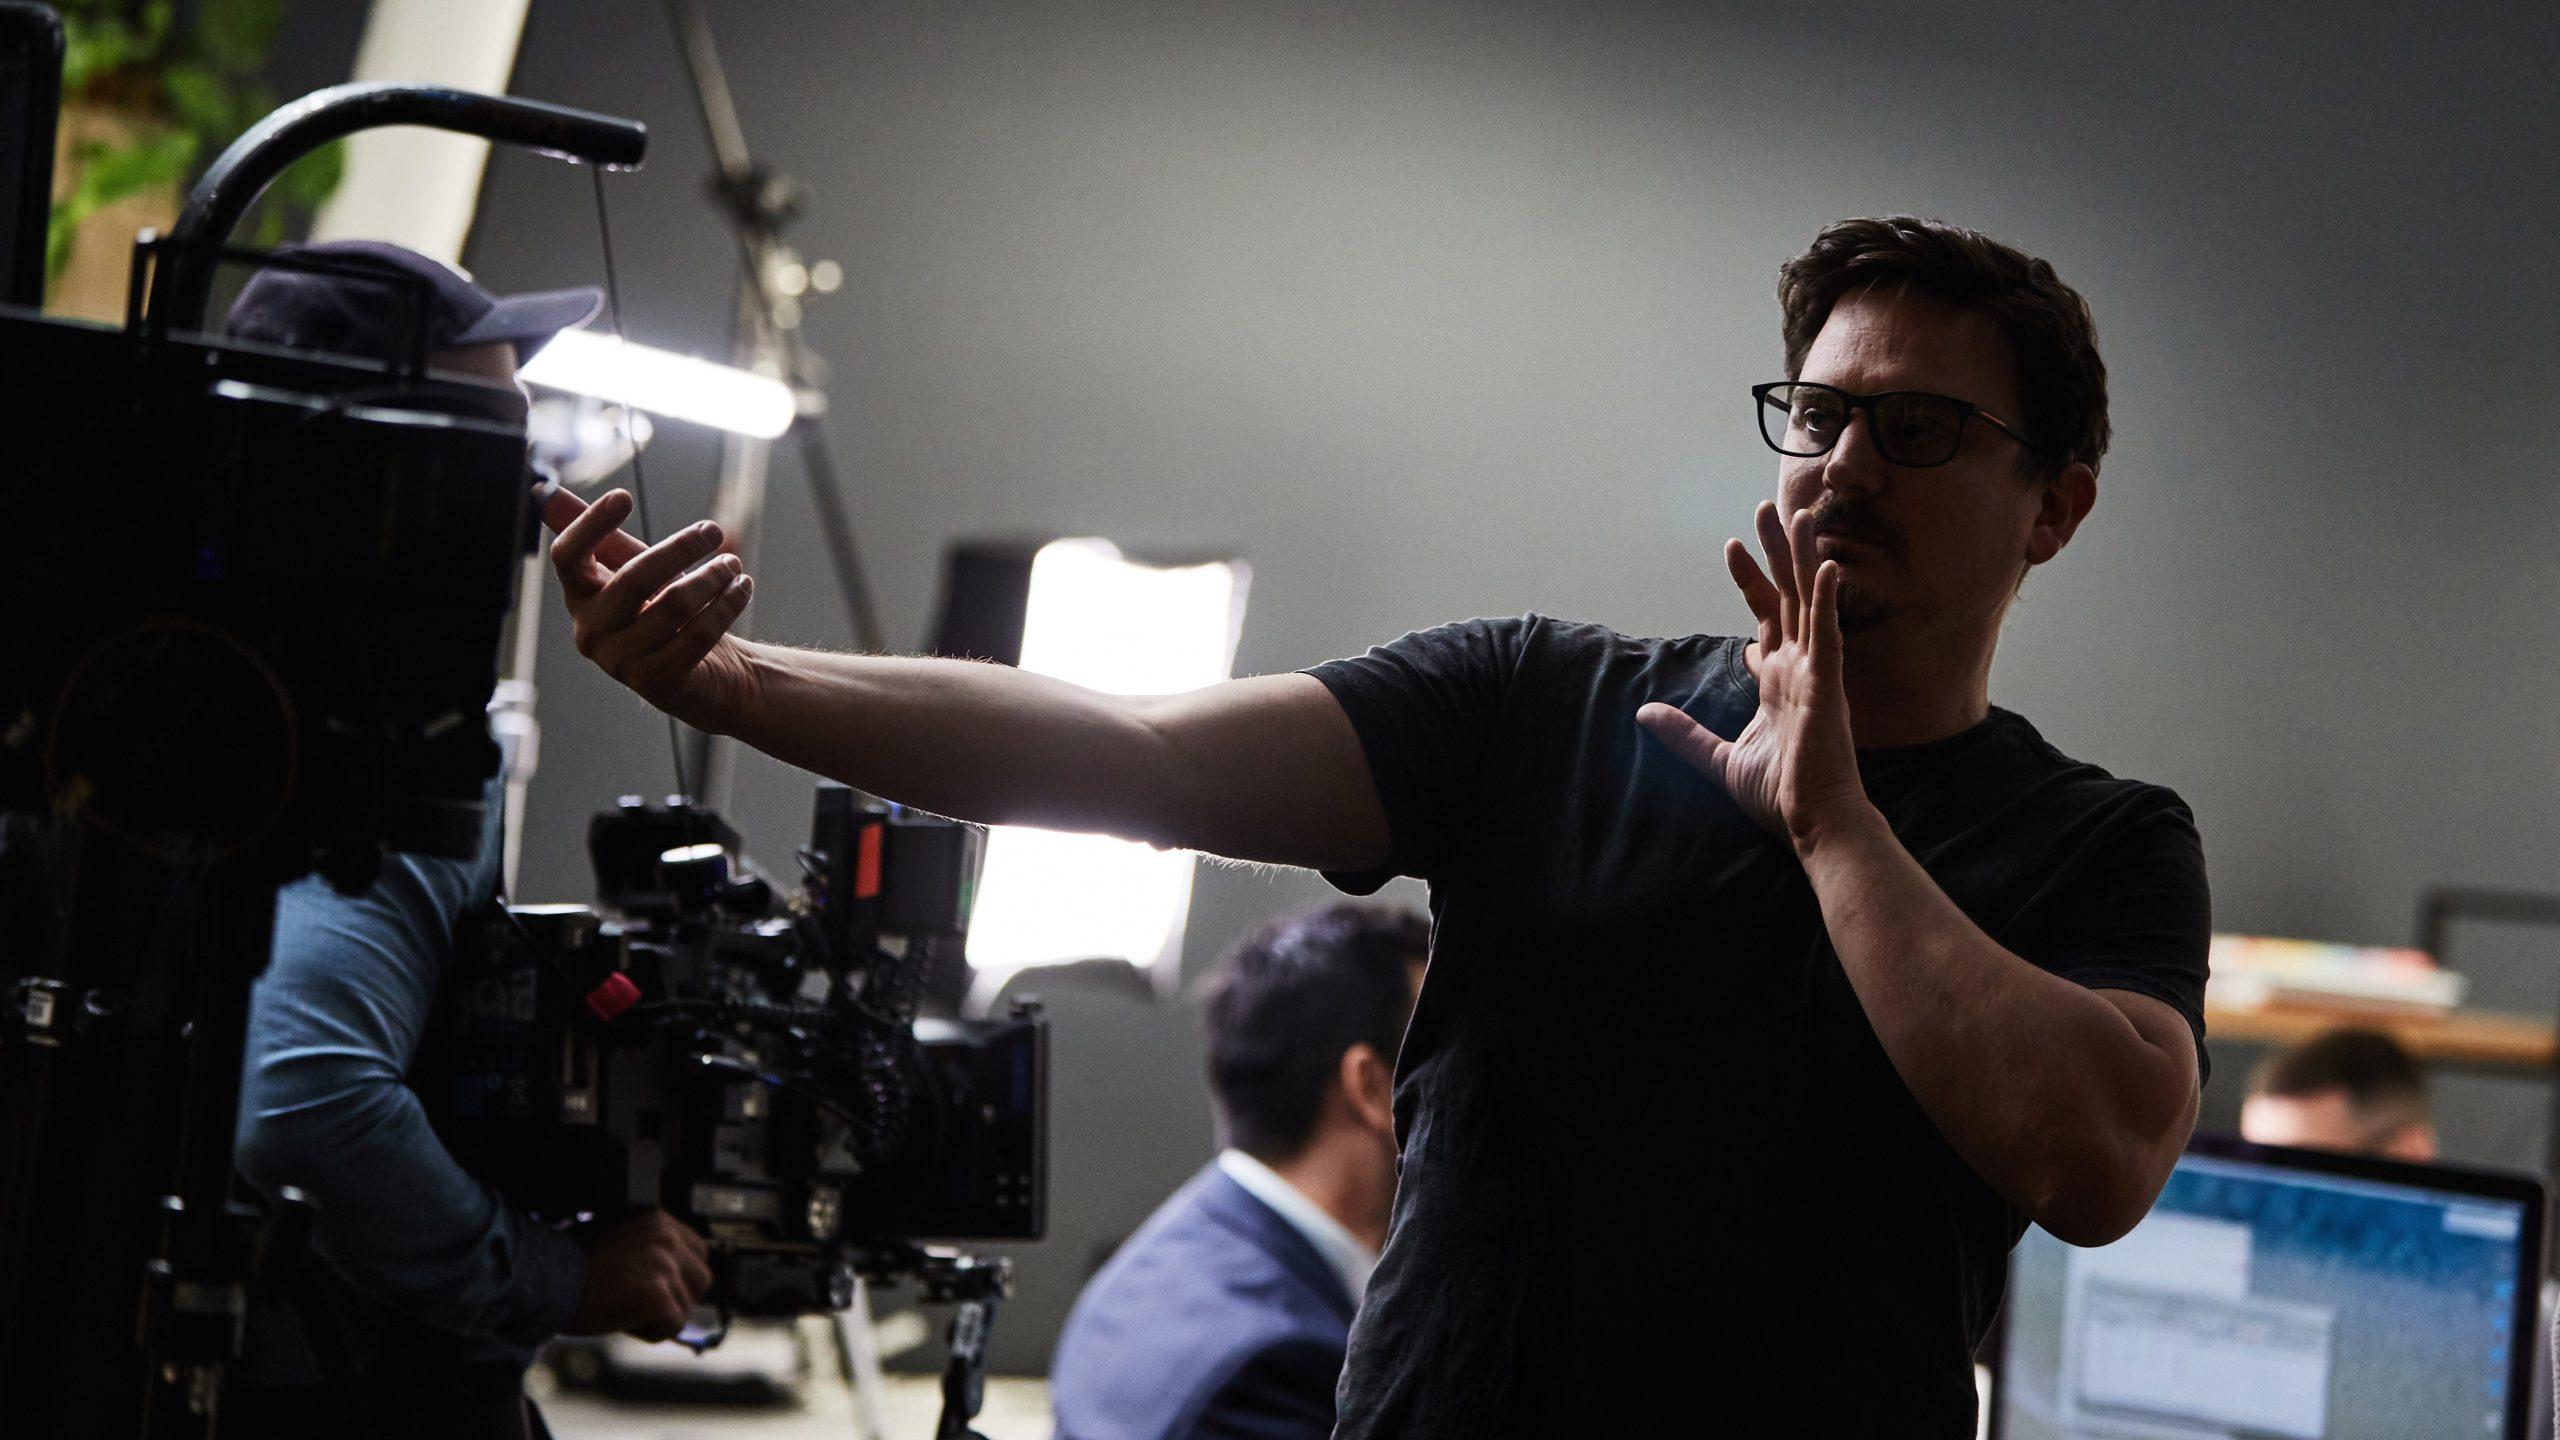 paul komadina interview pk filmmaking